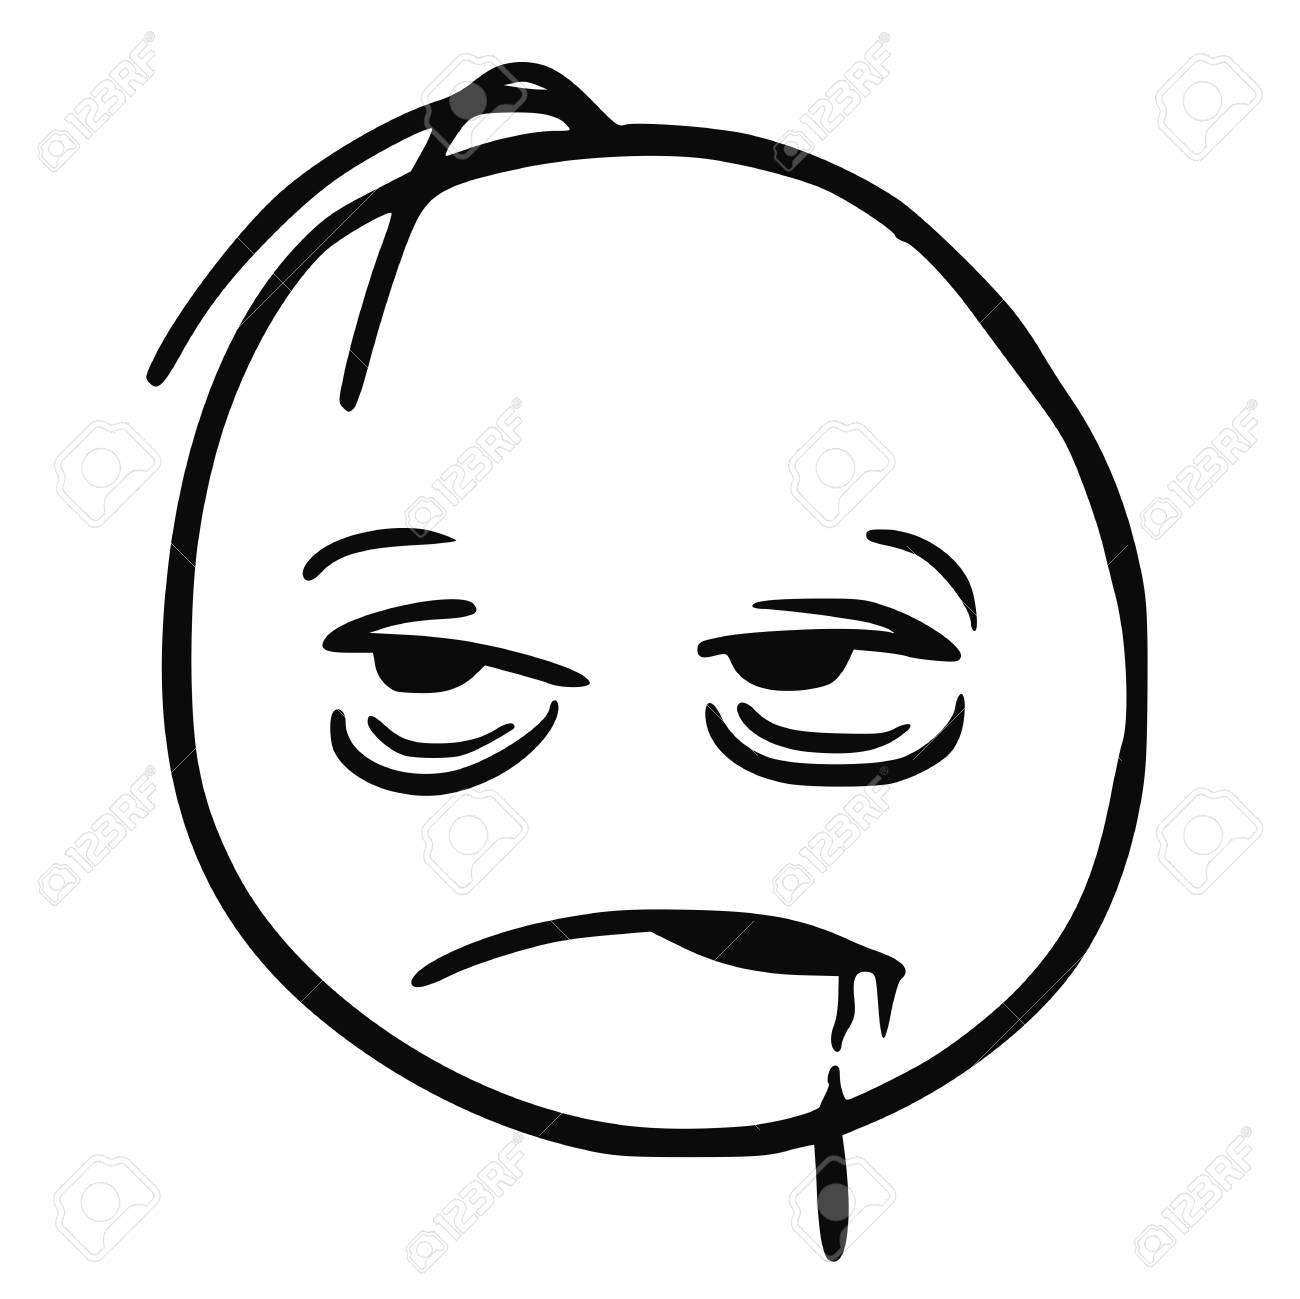 cartoon vector stickman who is very tired sick sleepy drunken rh 123rf com Hungry Face Cartoon tired looking face cartoon